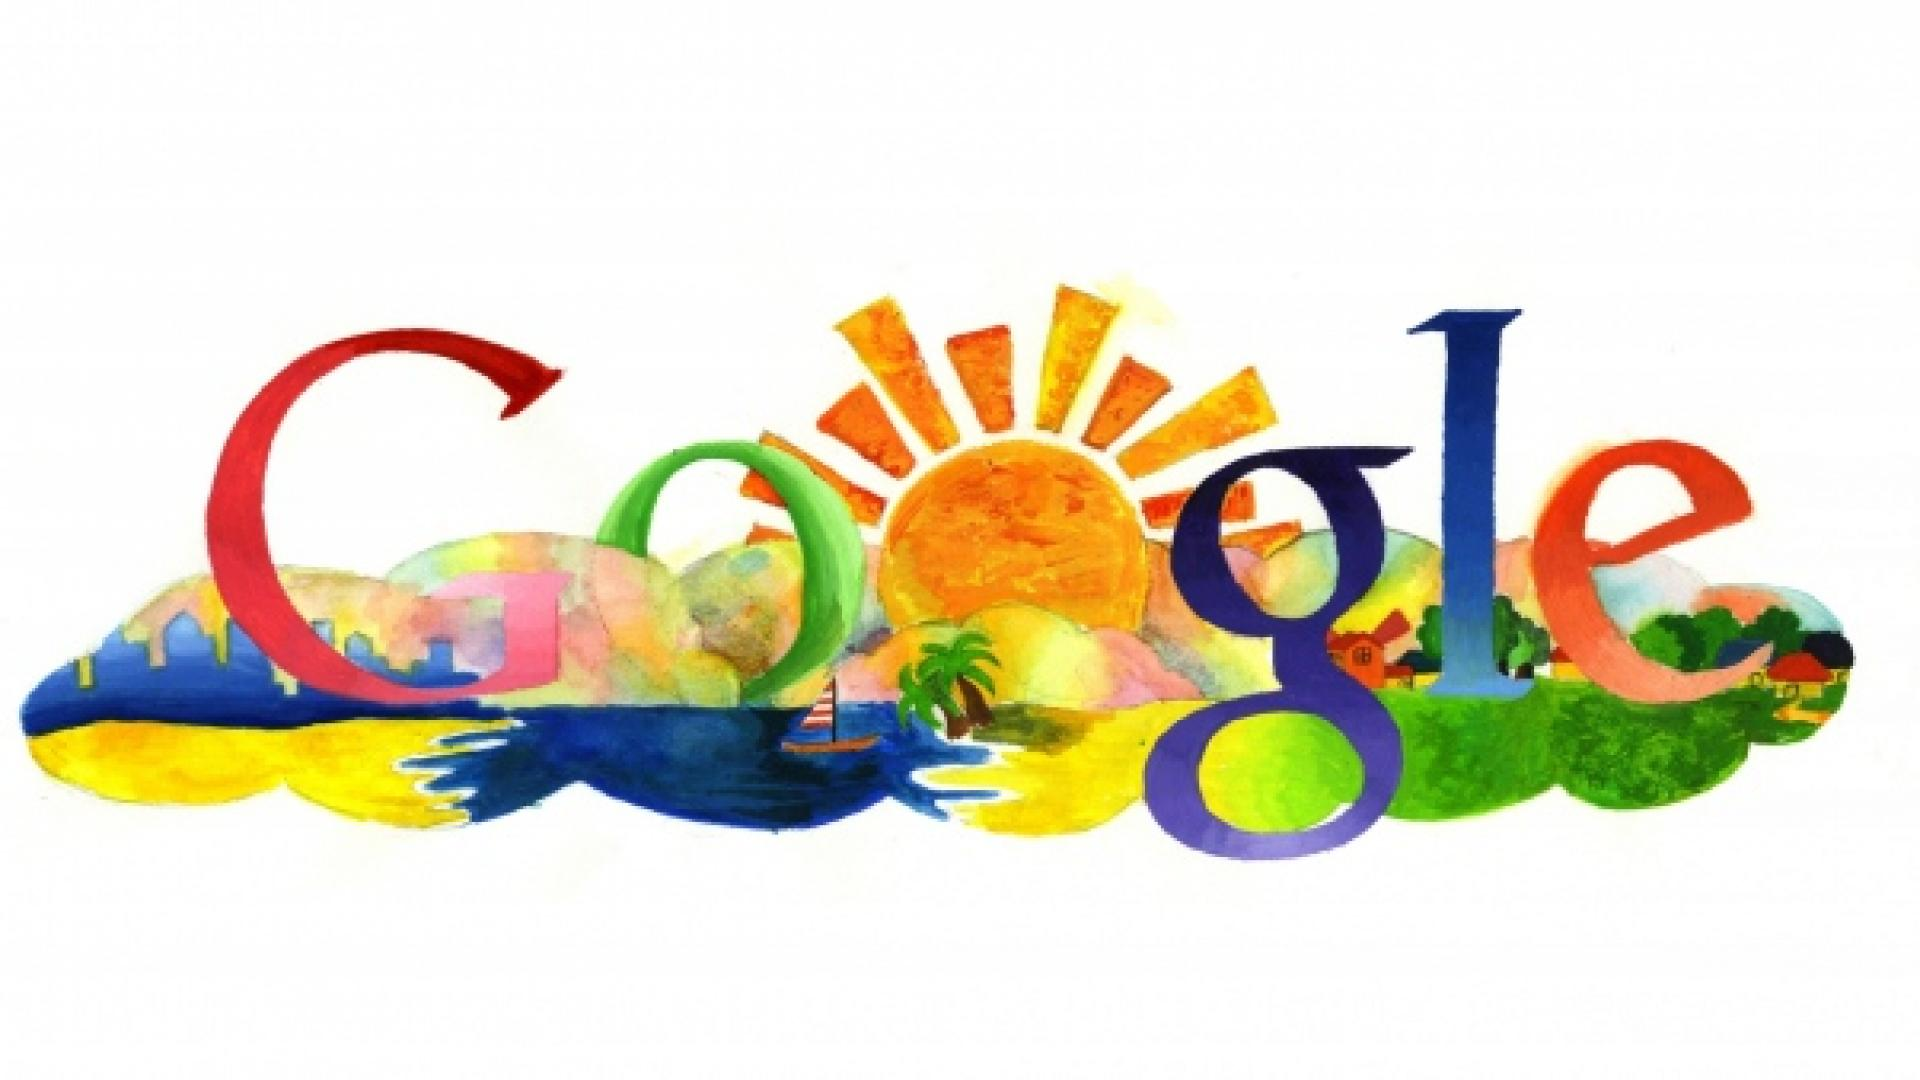 Google themes themebeta - Google Themes Themebeta 38